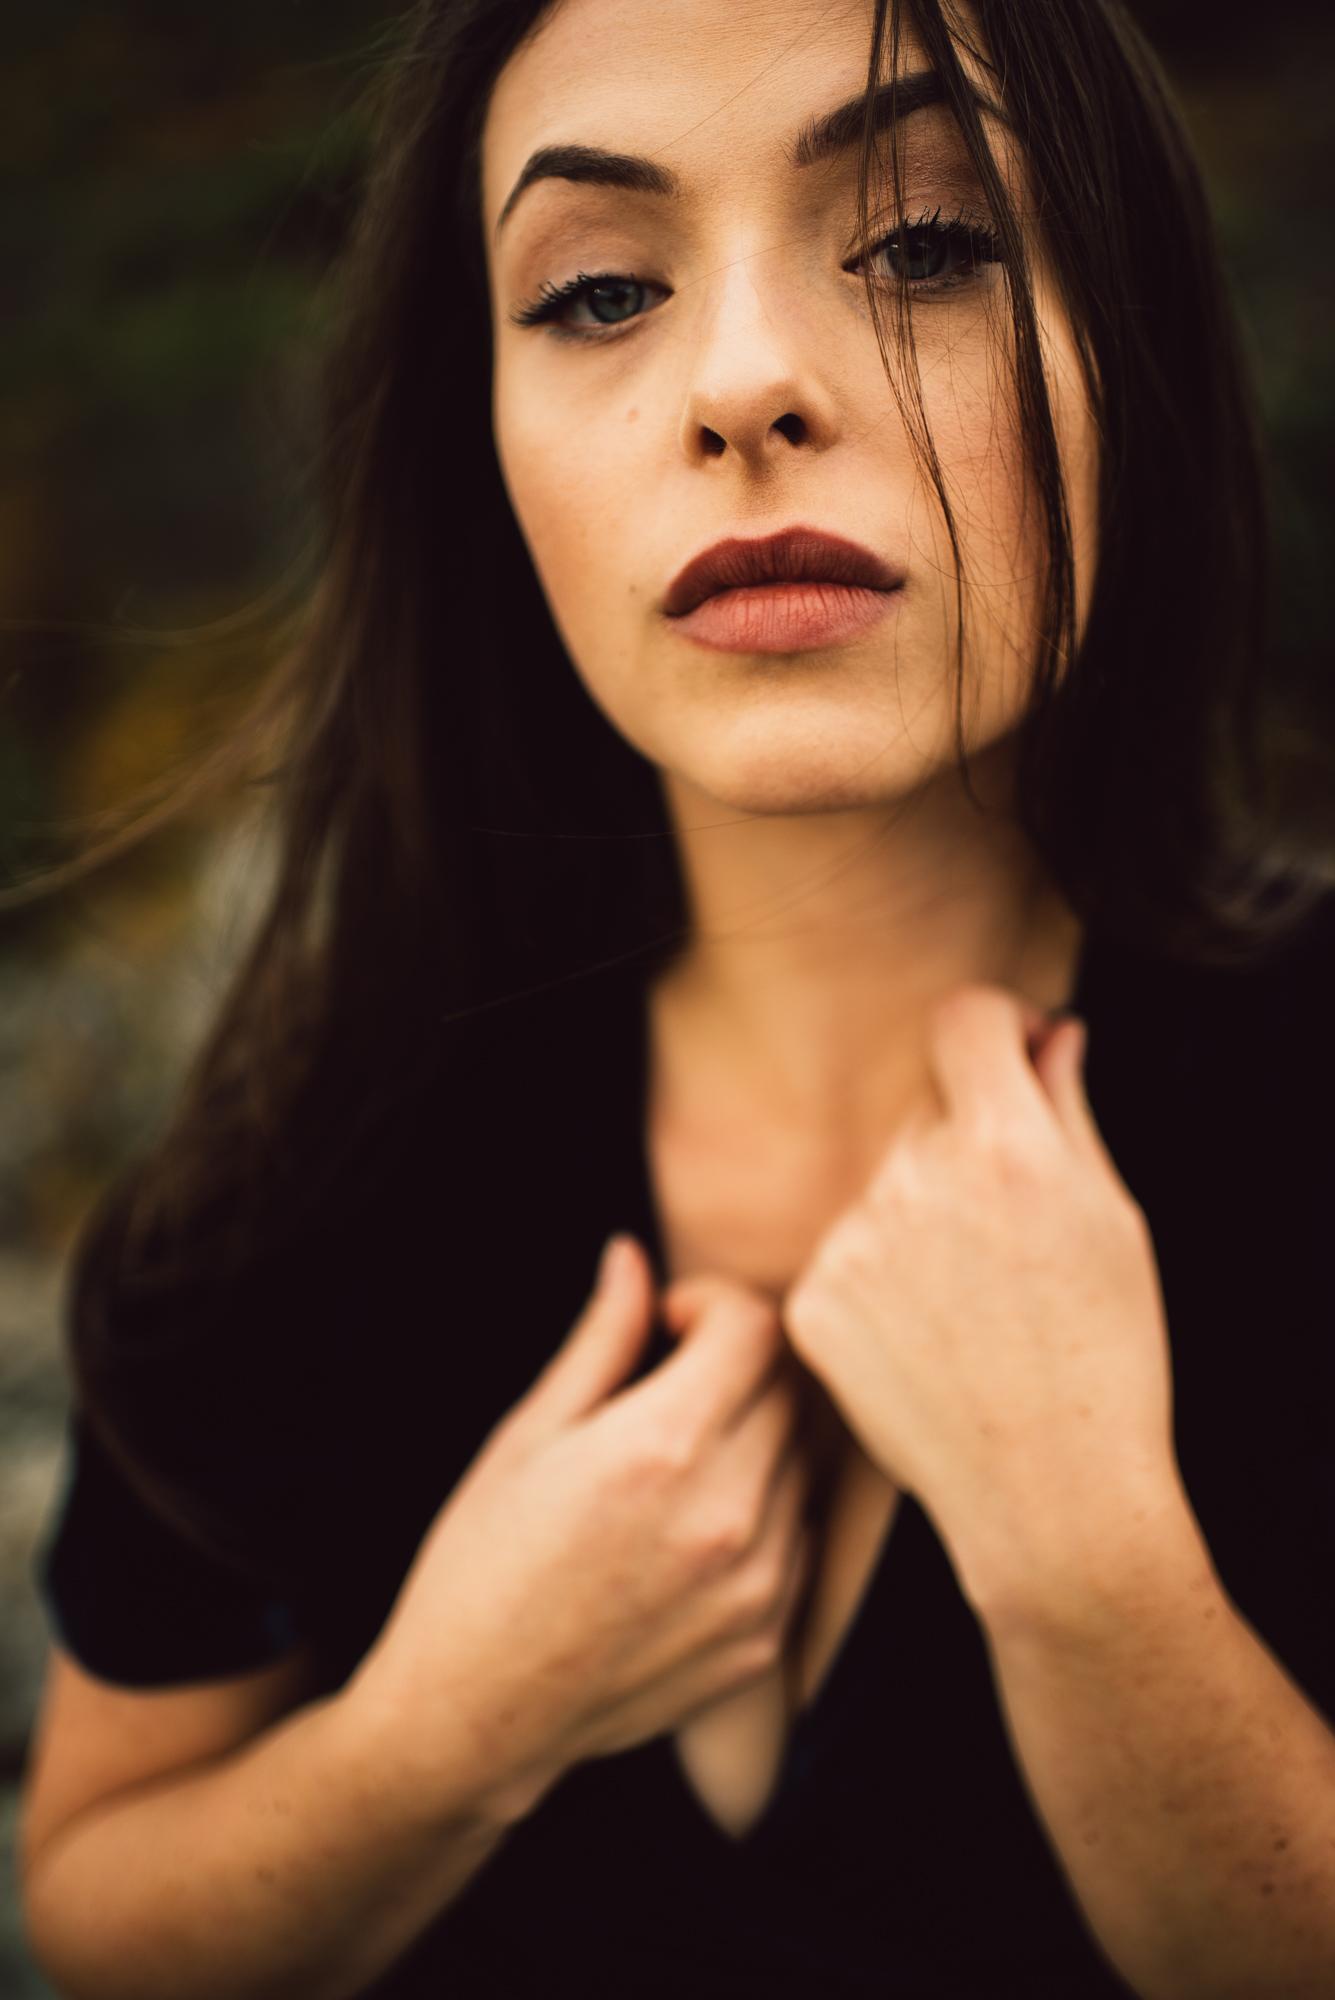 Megan_Shenandoah_National_Park_Windy_Romantic_Portraits_136.JPG